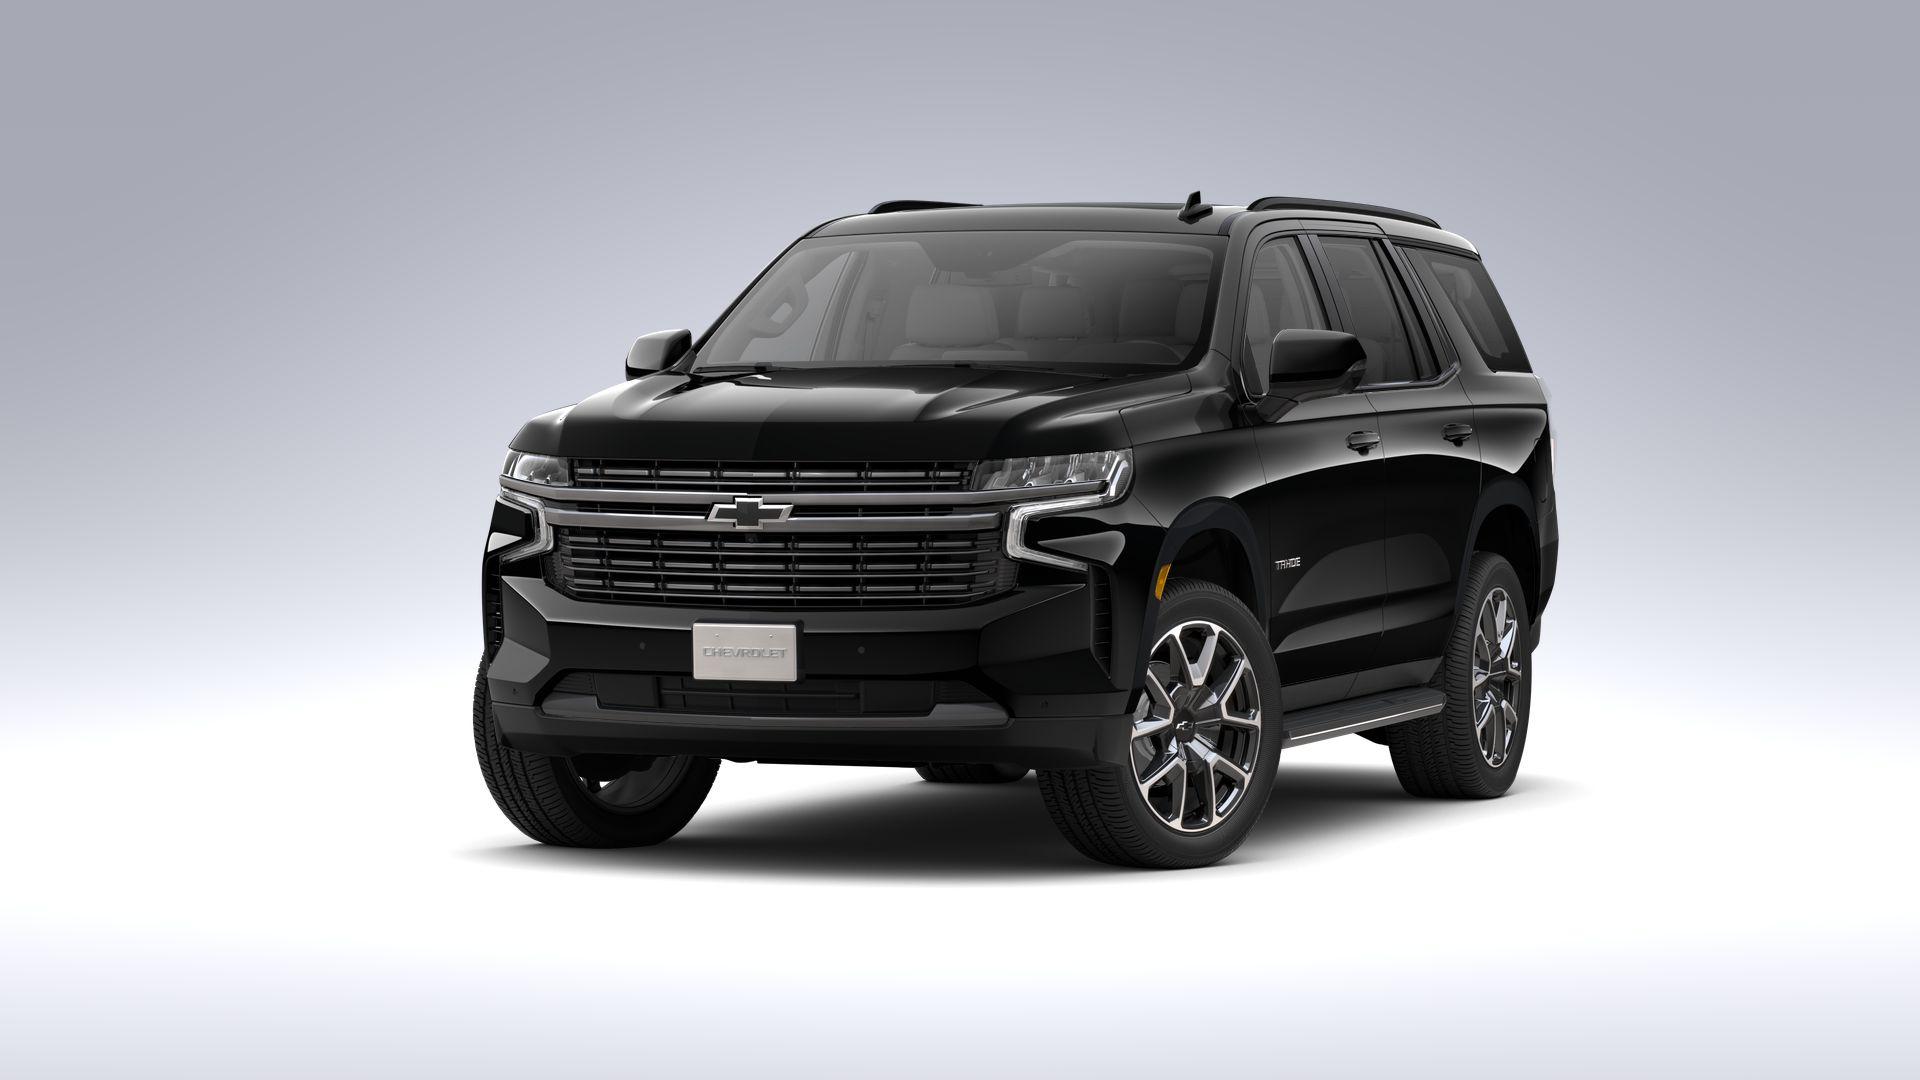 2022 Chevrolet Tahoe SUV